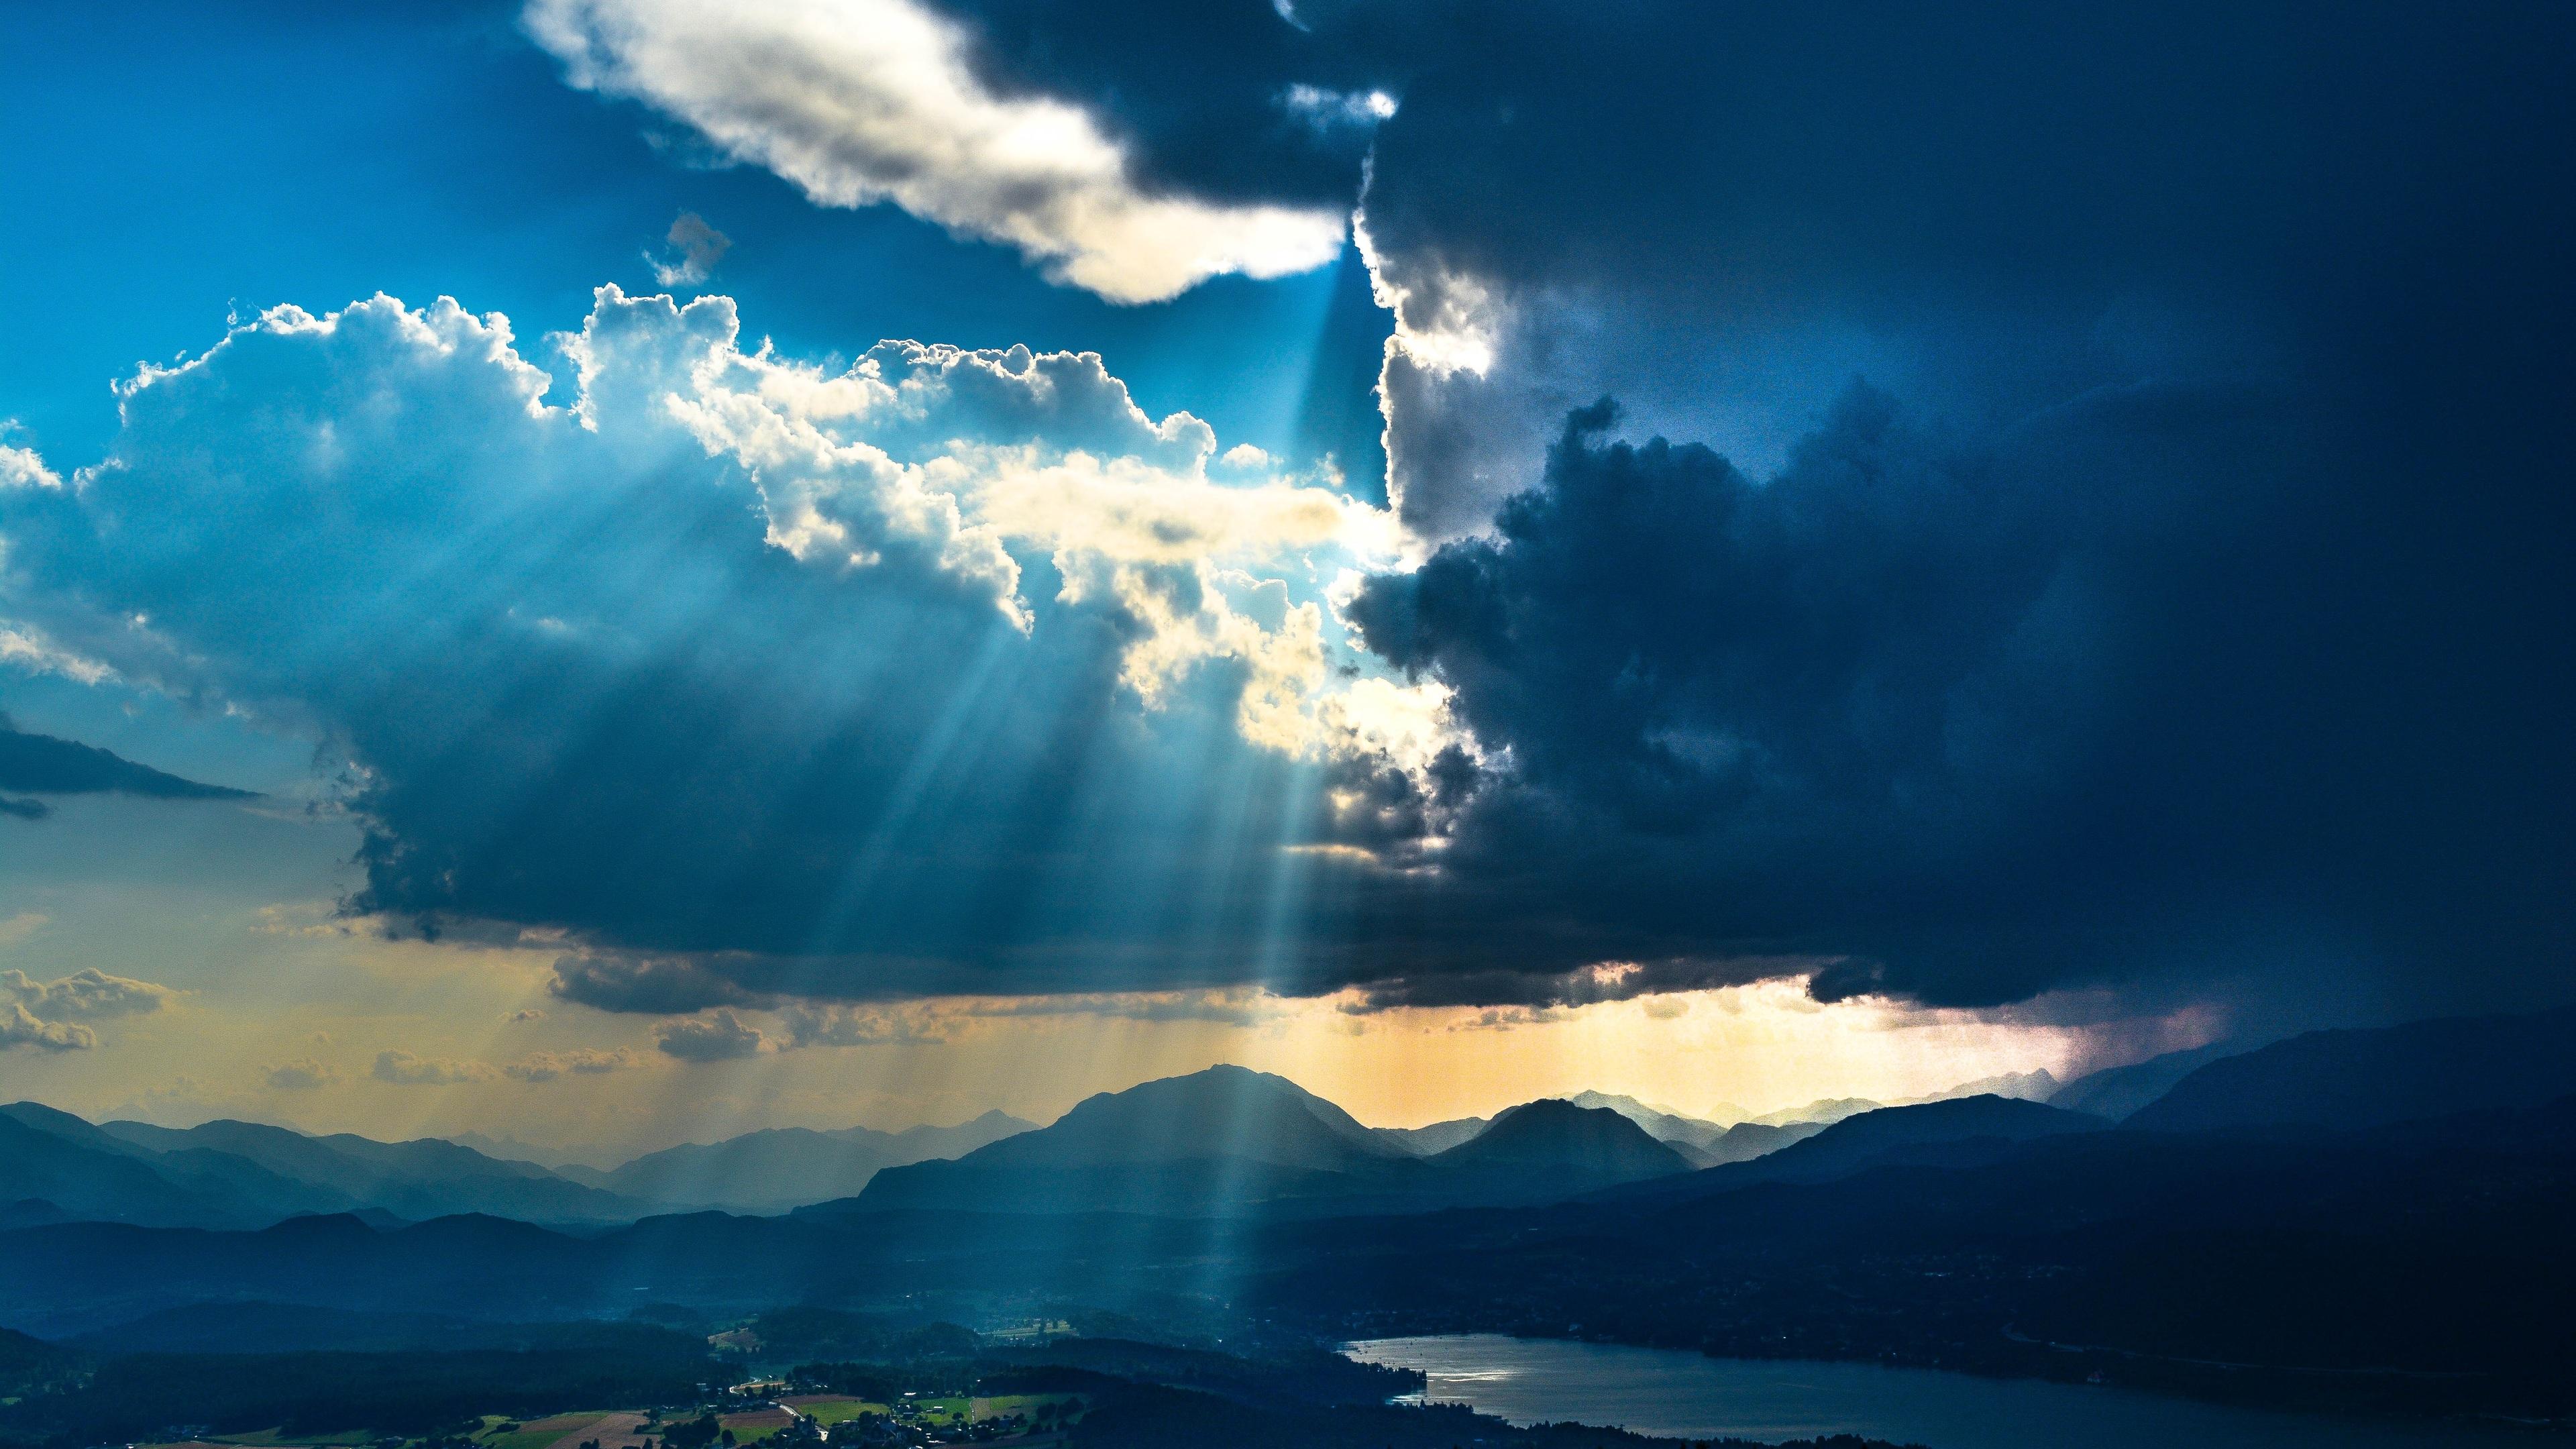 sunbeams from sky landscape mountains 4k 1540137267 - Sunbeams From Sky Landscape Mountains 4k - sunbeam wallpapers, nature wallpapers, mountains wallpapers, landscape wallpapers, hd-wallpapers, 5k wallpapers, 4k-wallpapers